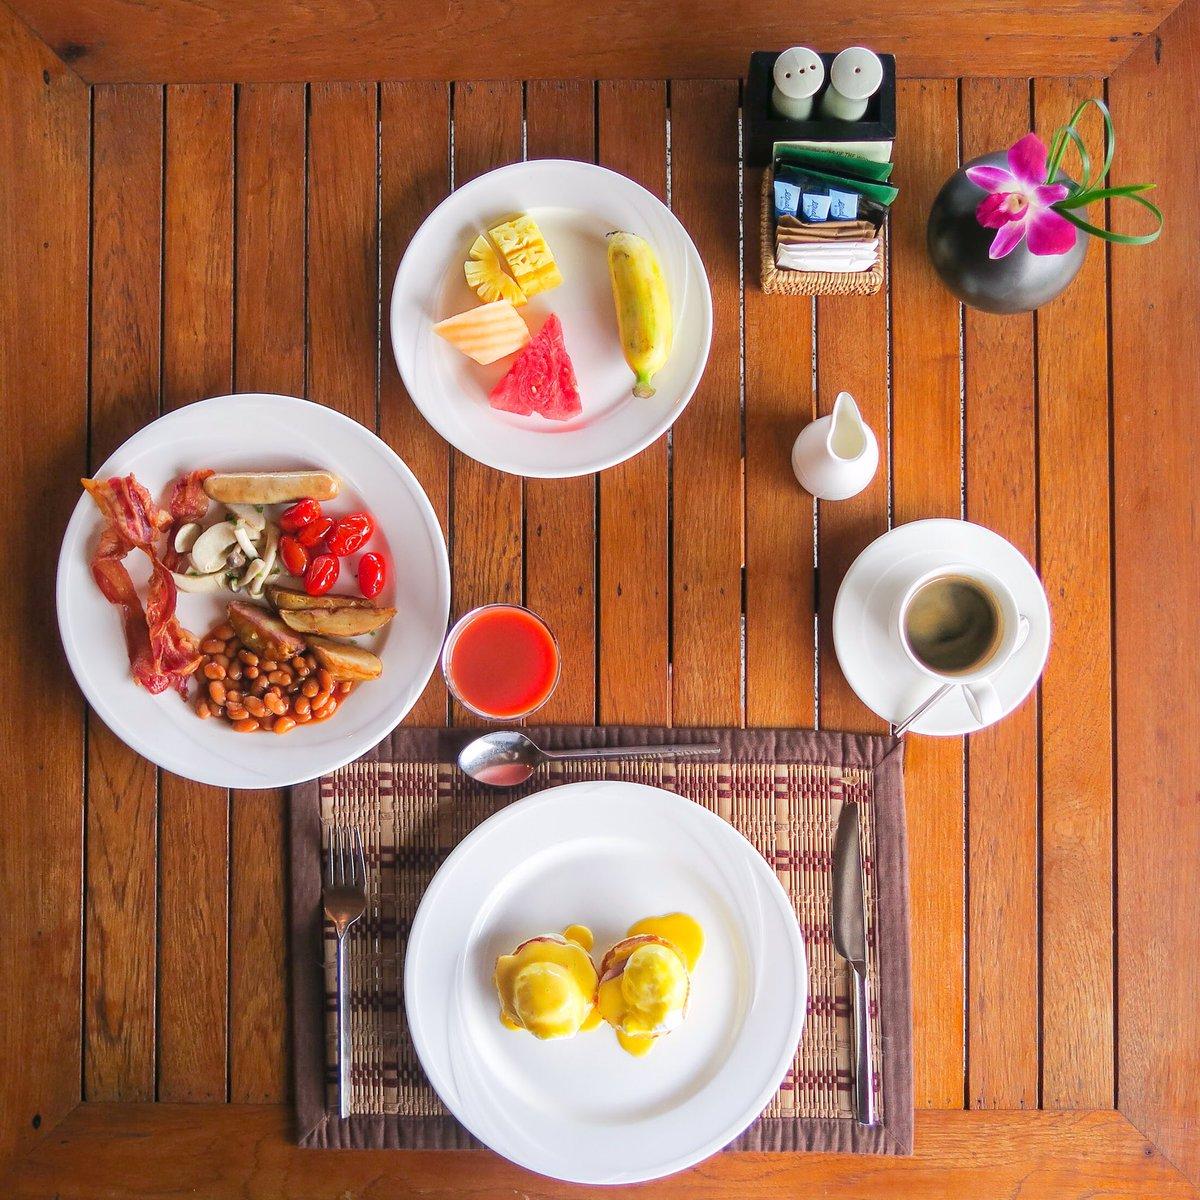 The #perfect #breakfast doesn&#39;t...  #Pimalai @pimalaikohlanta #krabi #kohlanta #thailand #thai #eggsbenedict #foodblog #travelblog<br>http://pic.twitter.com/y4h6Rg9CZi